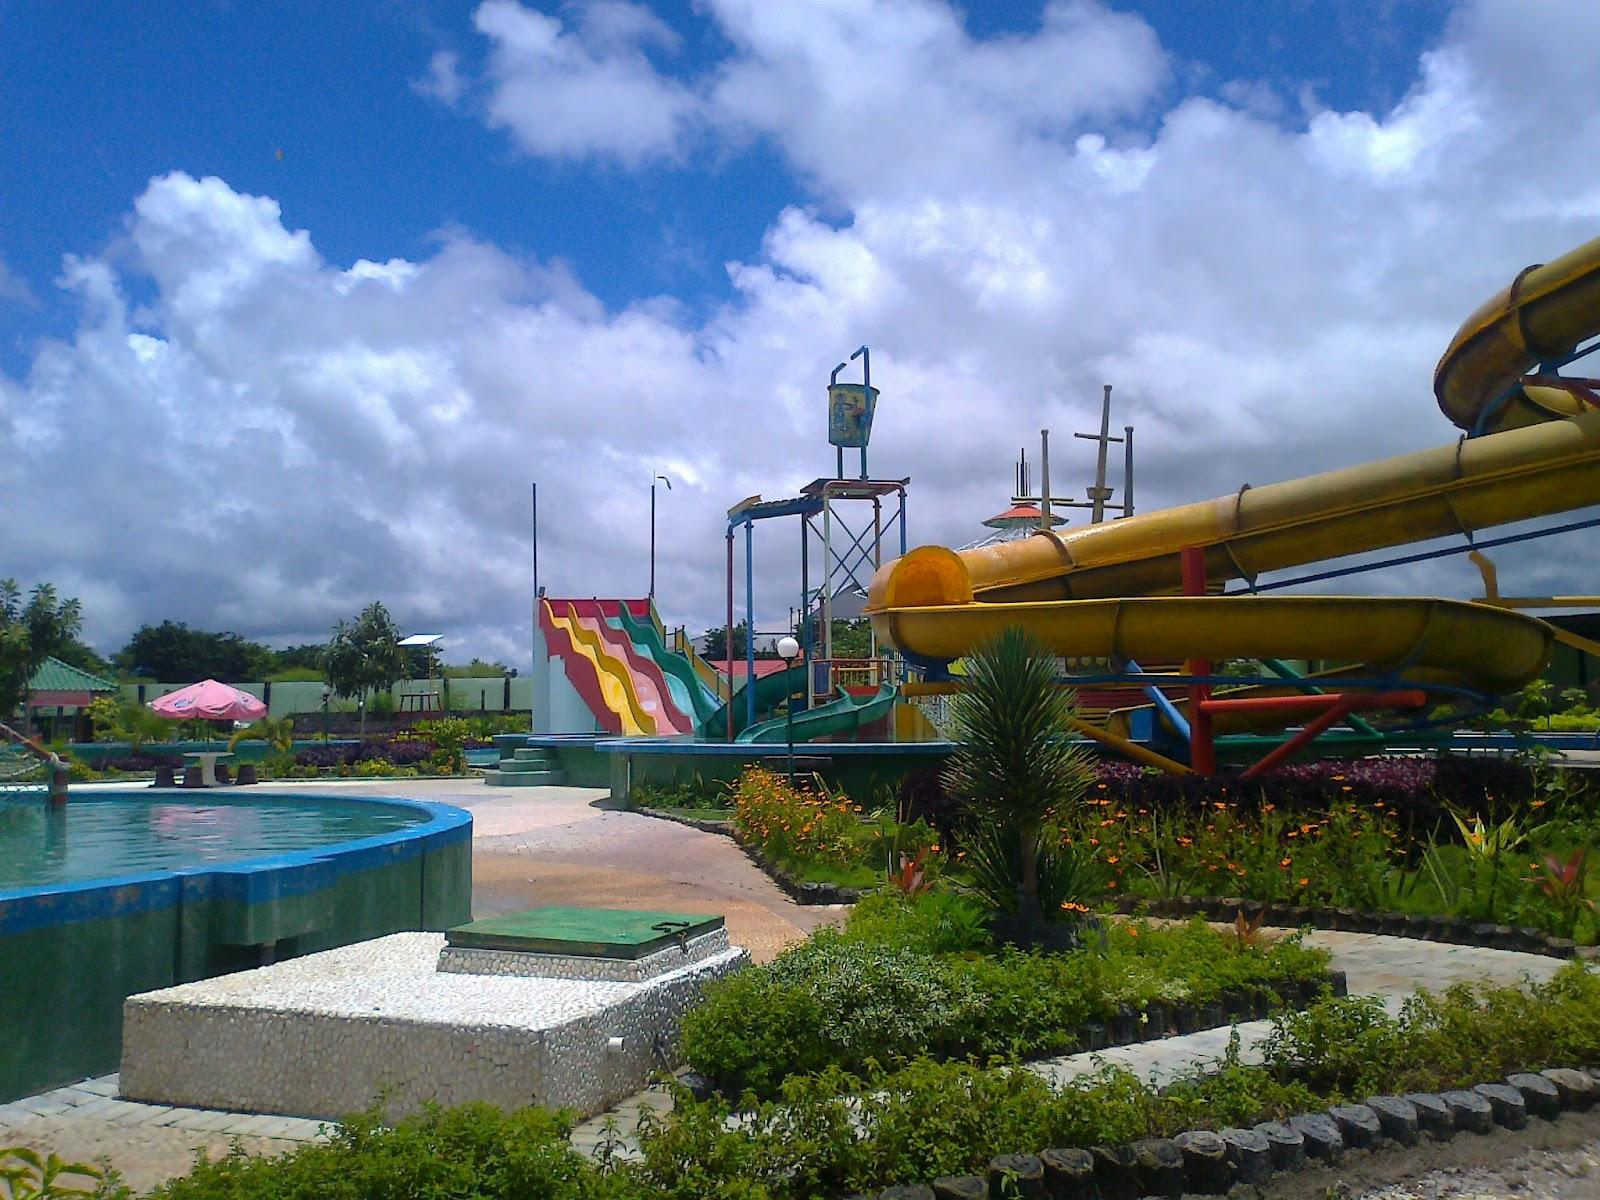 Top 20 Kupang East Nusa Tenggara Indonesia Water Park Waterpark